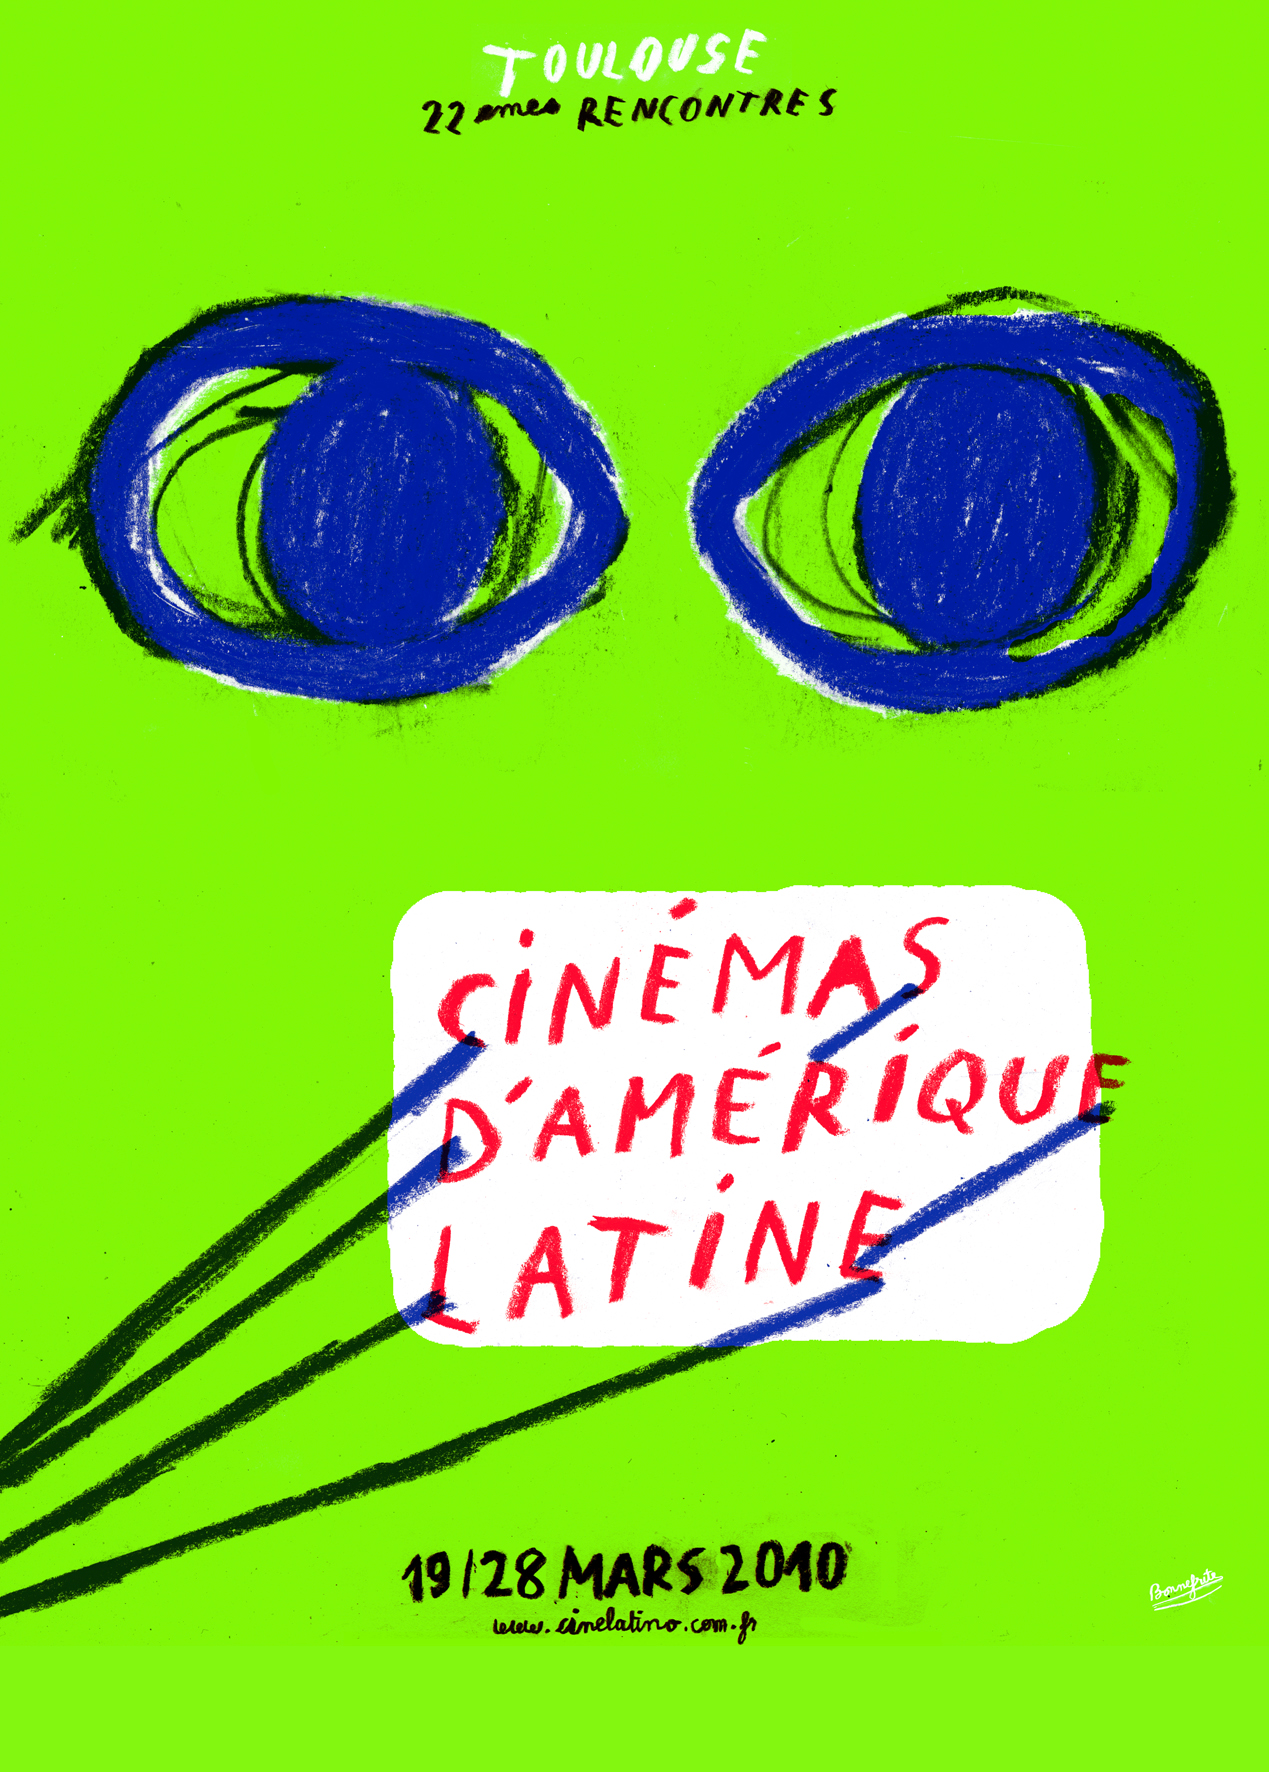 rencontre cinema amerique latine toulouse)